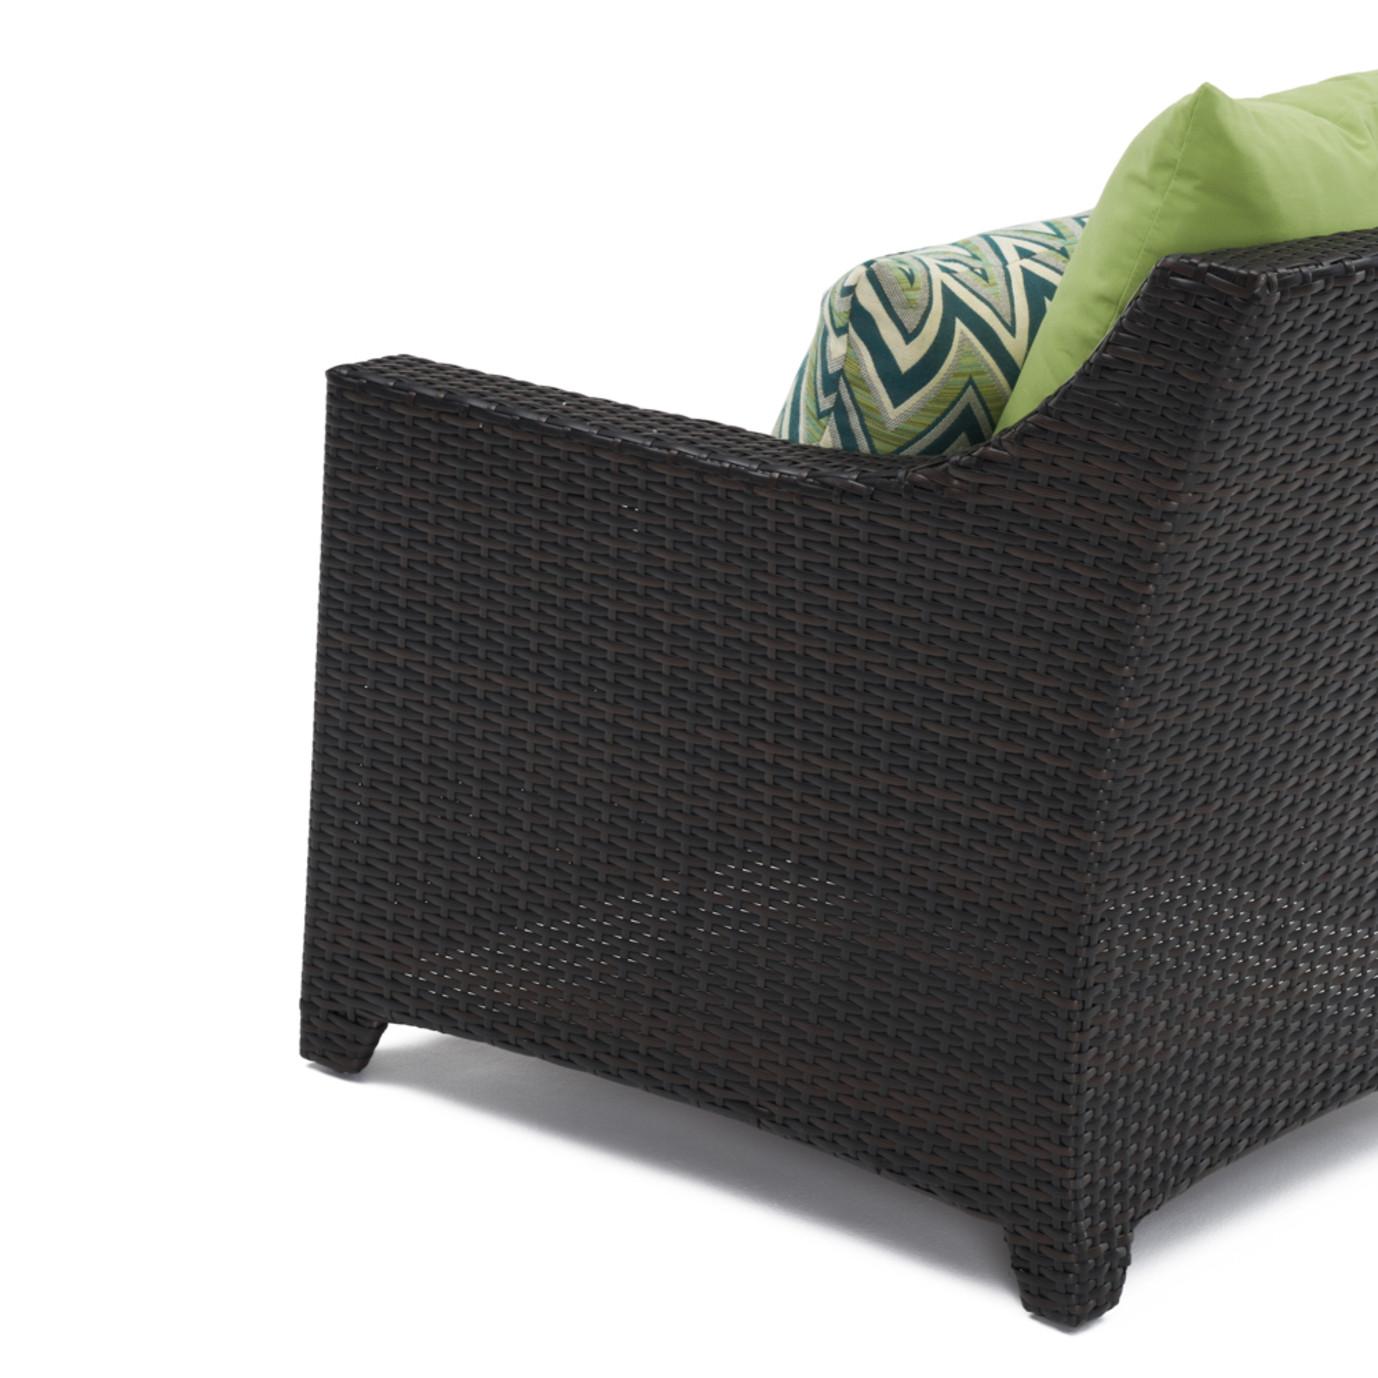 Deco™ Sofa - Ginkgo Green